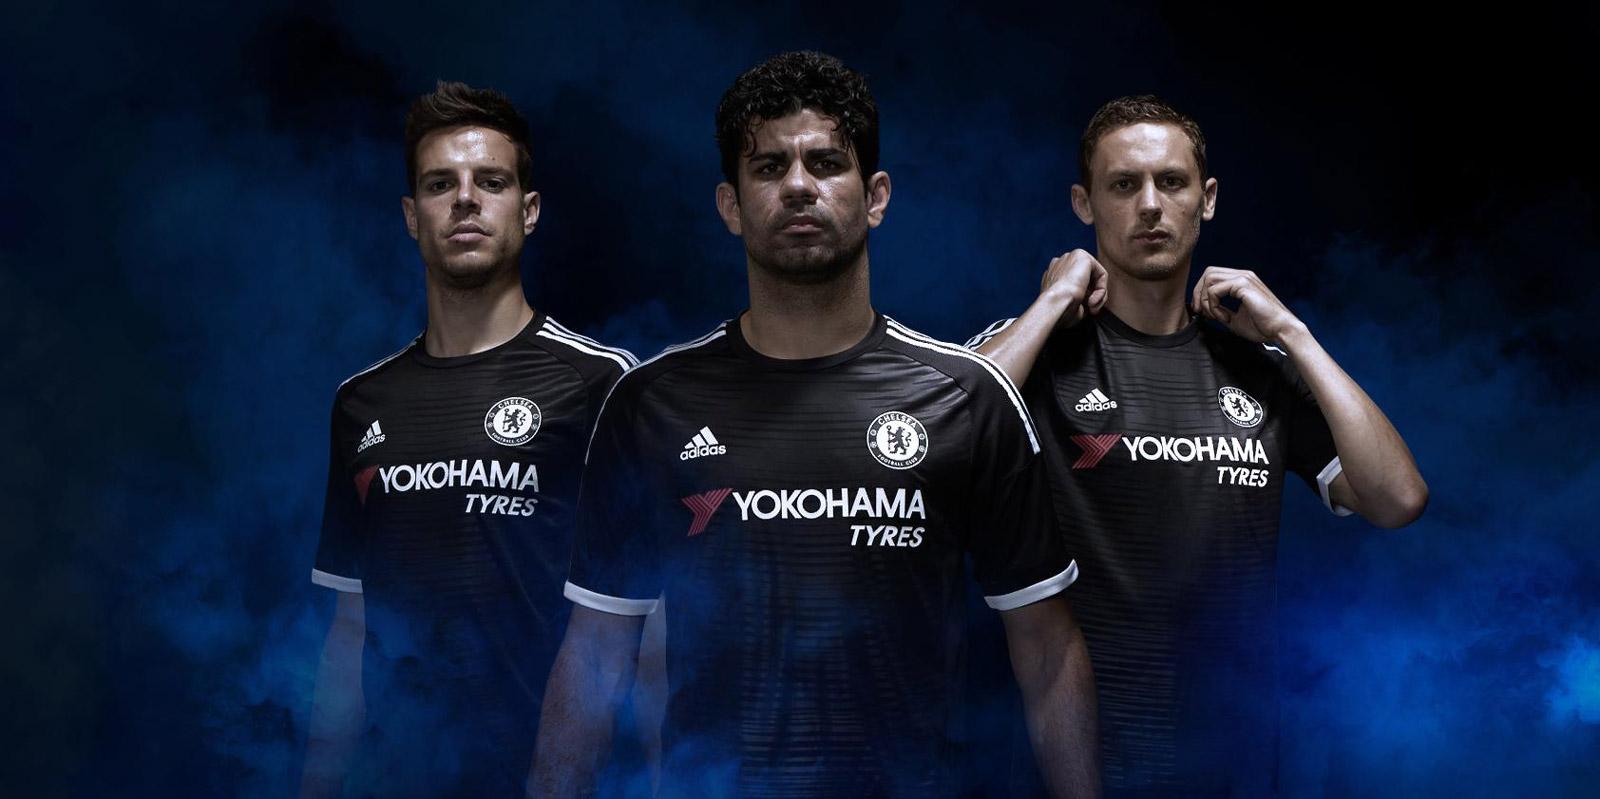 Chelsea Third Kit 201415 Season foto